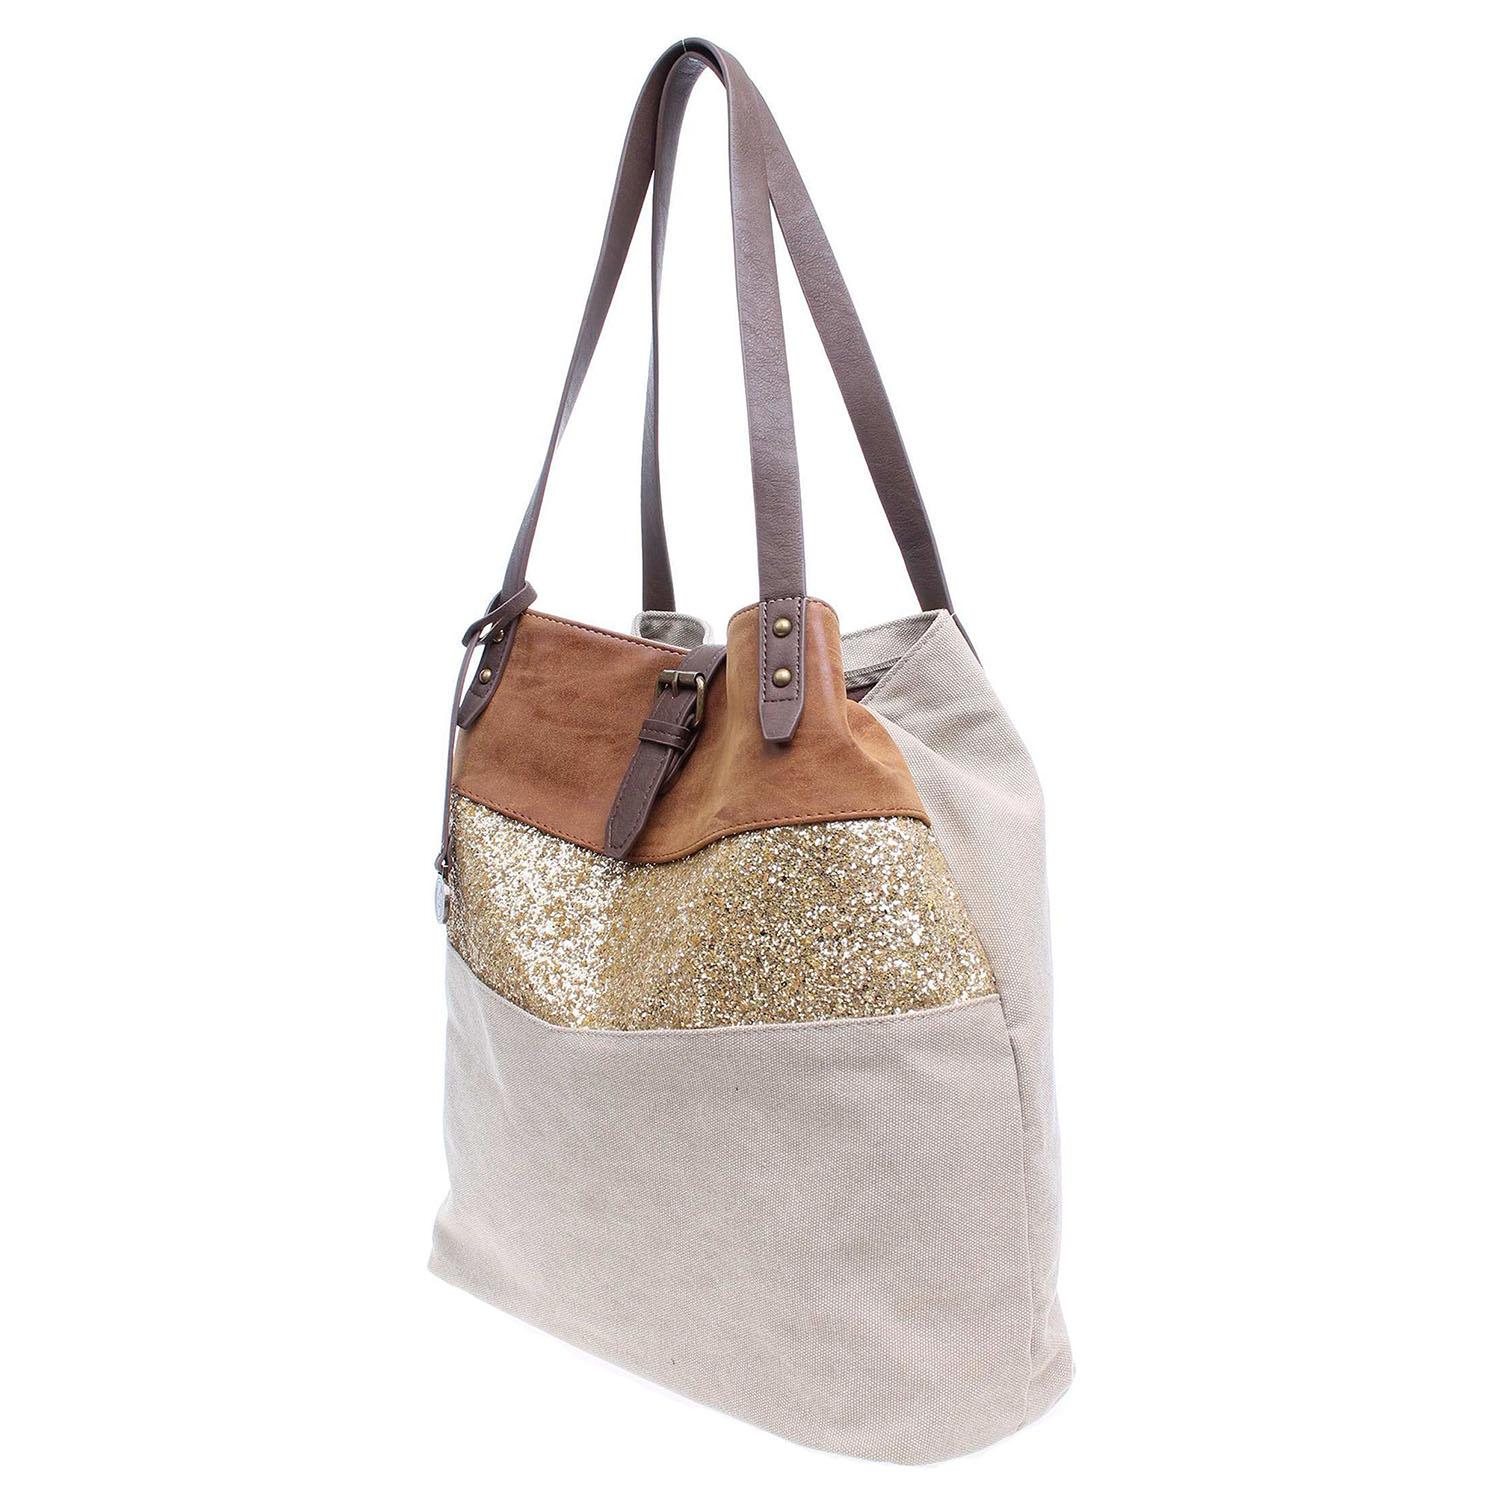 Ecco Dámská kabelka C1201GF hnědá-zlatá 11891198